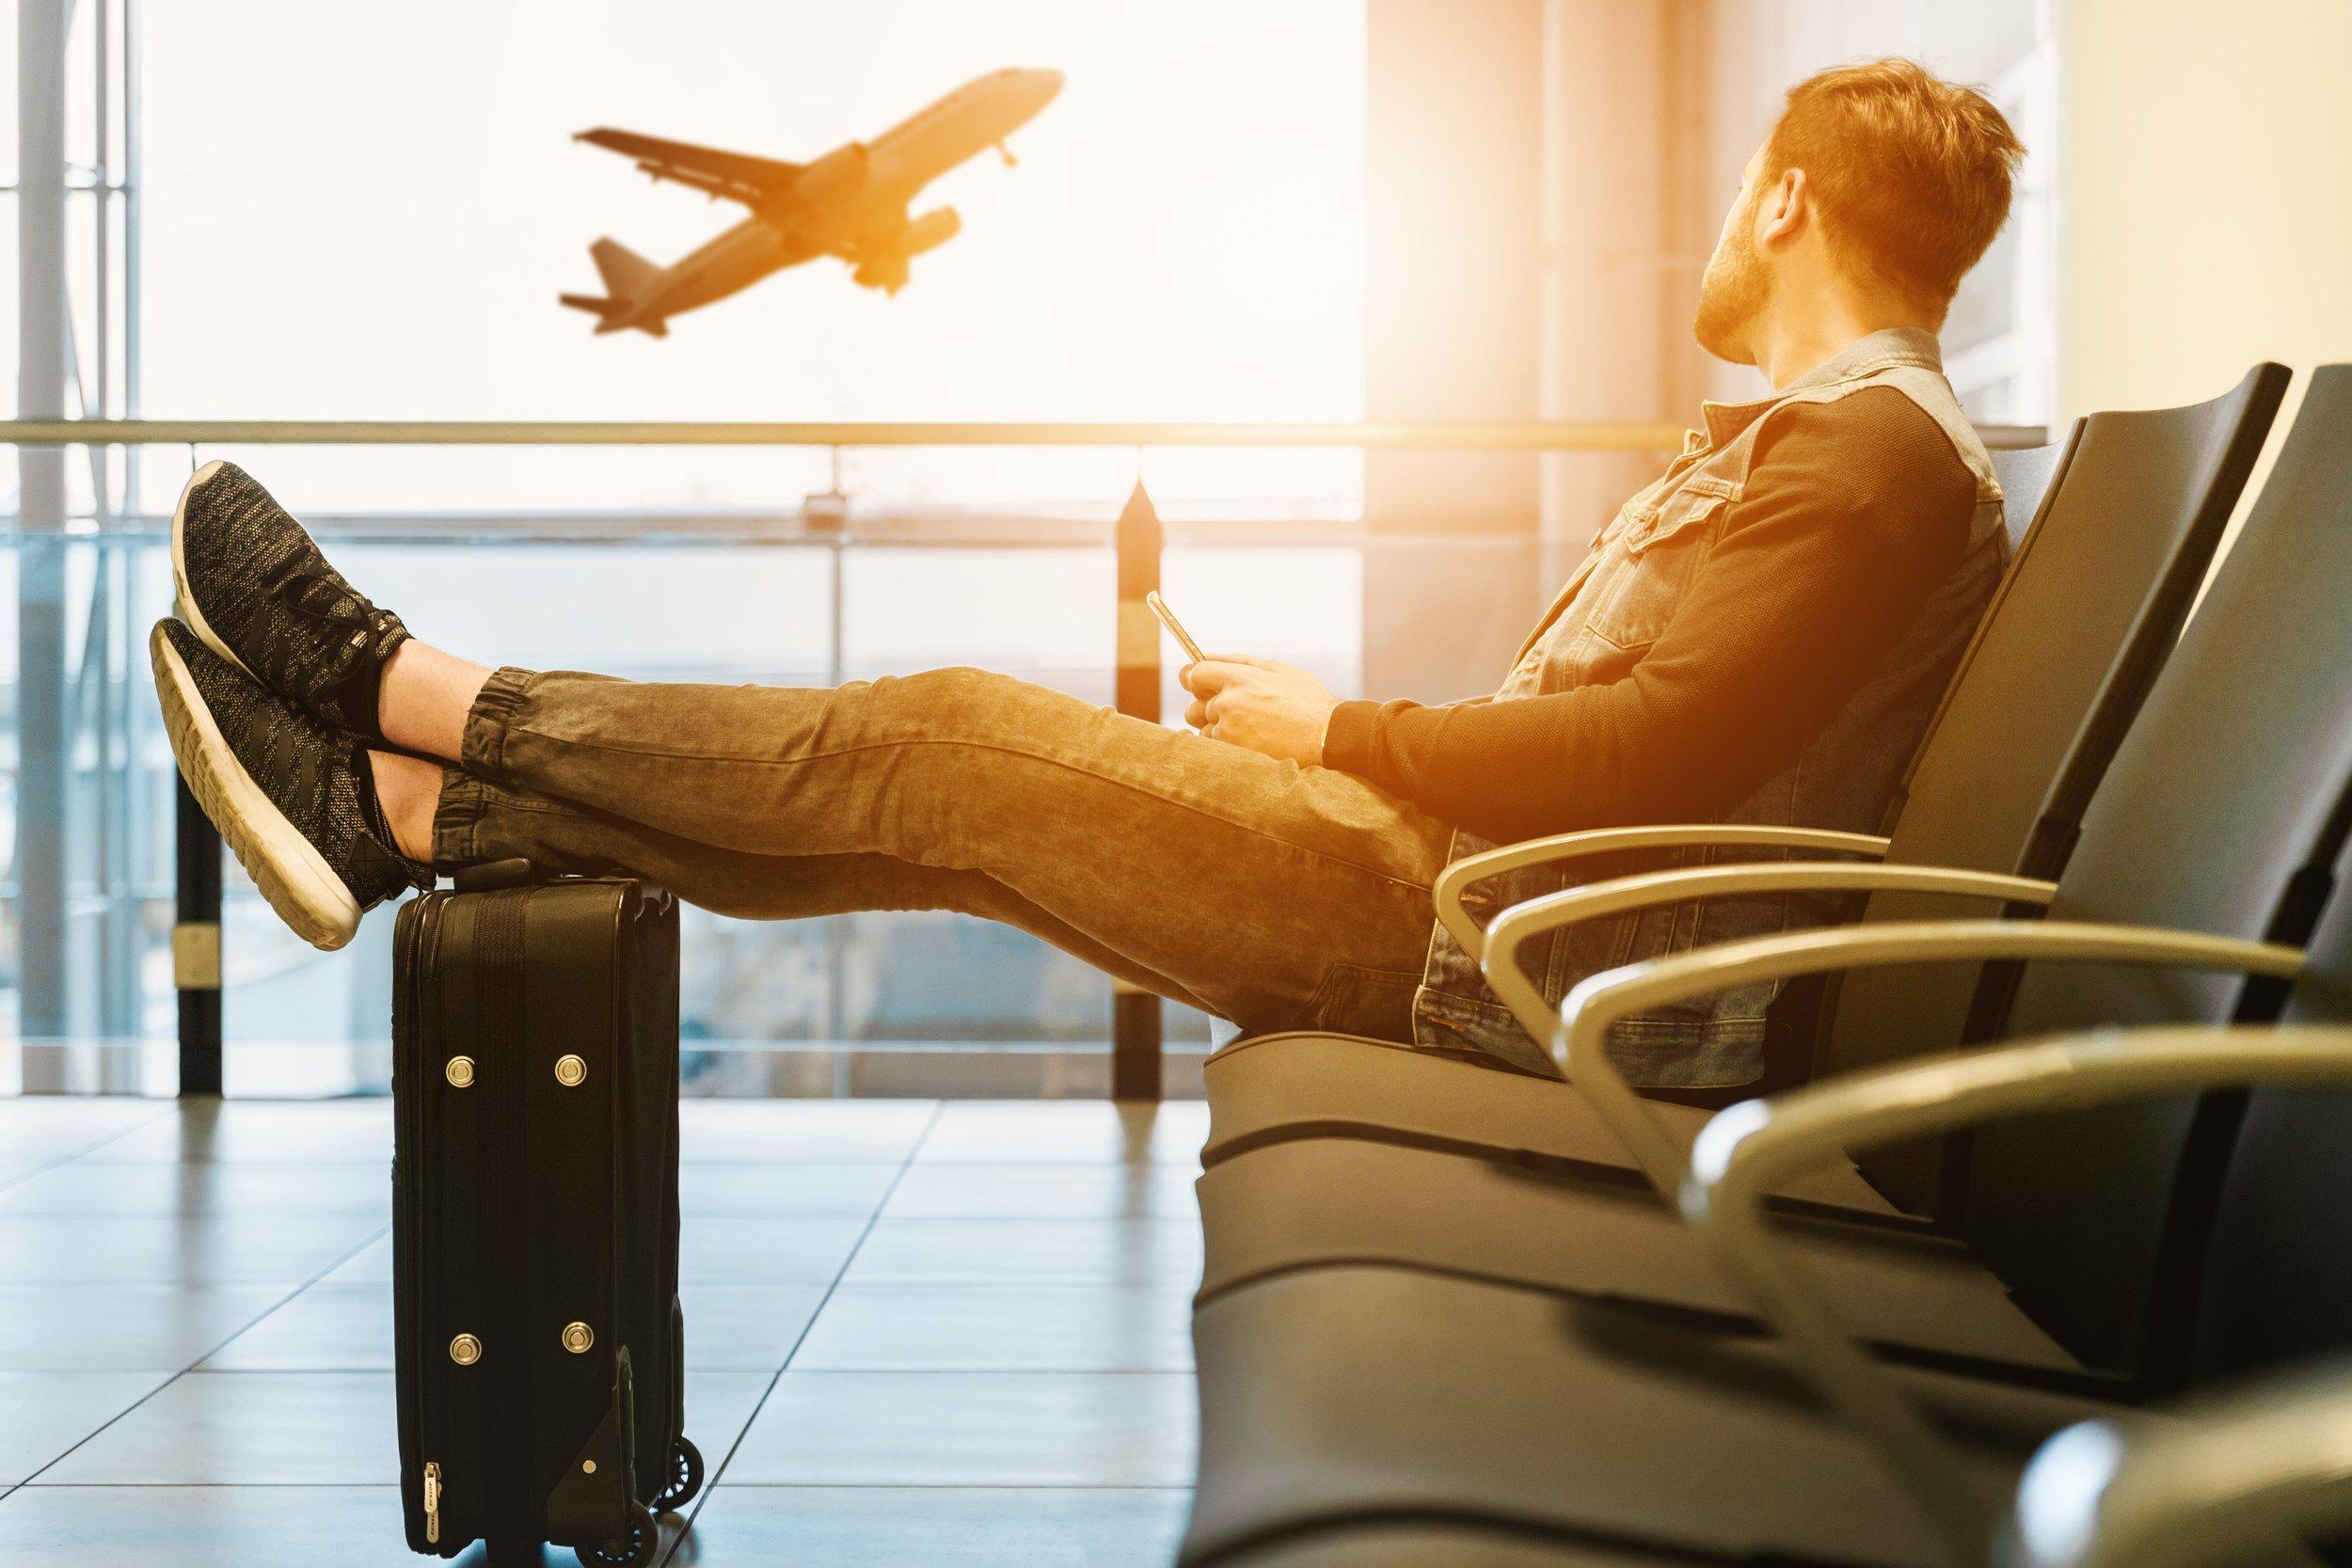 travel-wifi-yogofi-insurance-tips-flight-cancellation